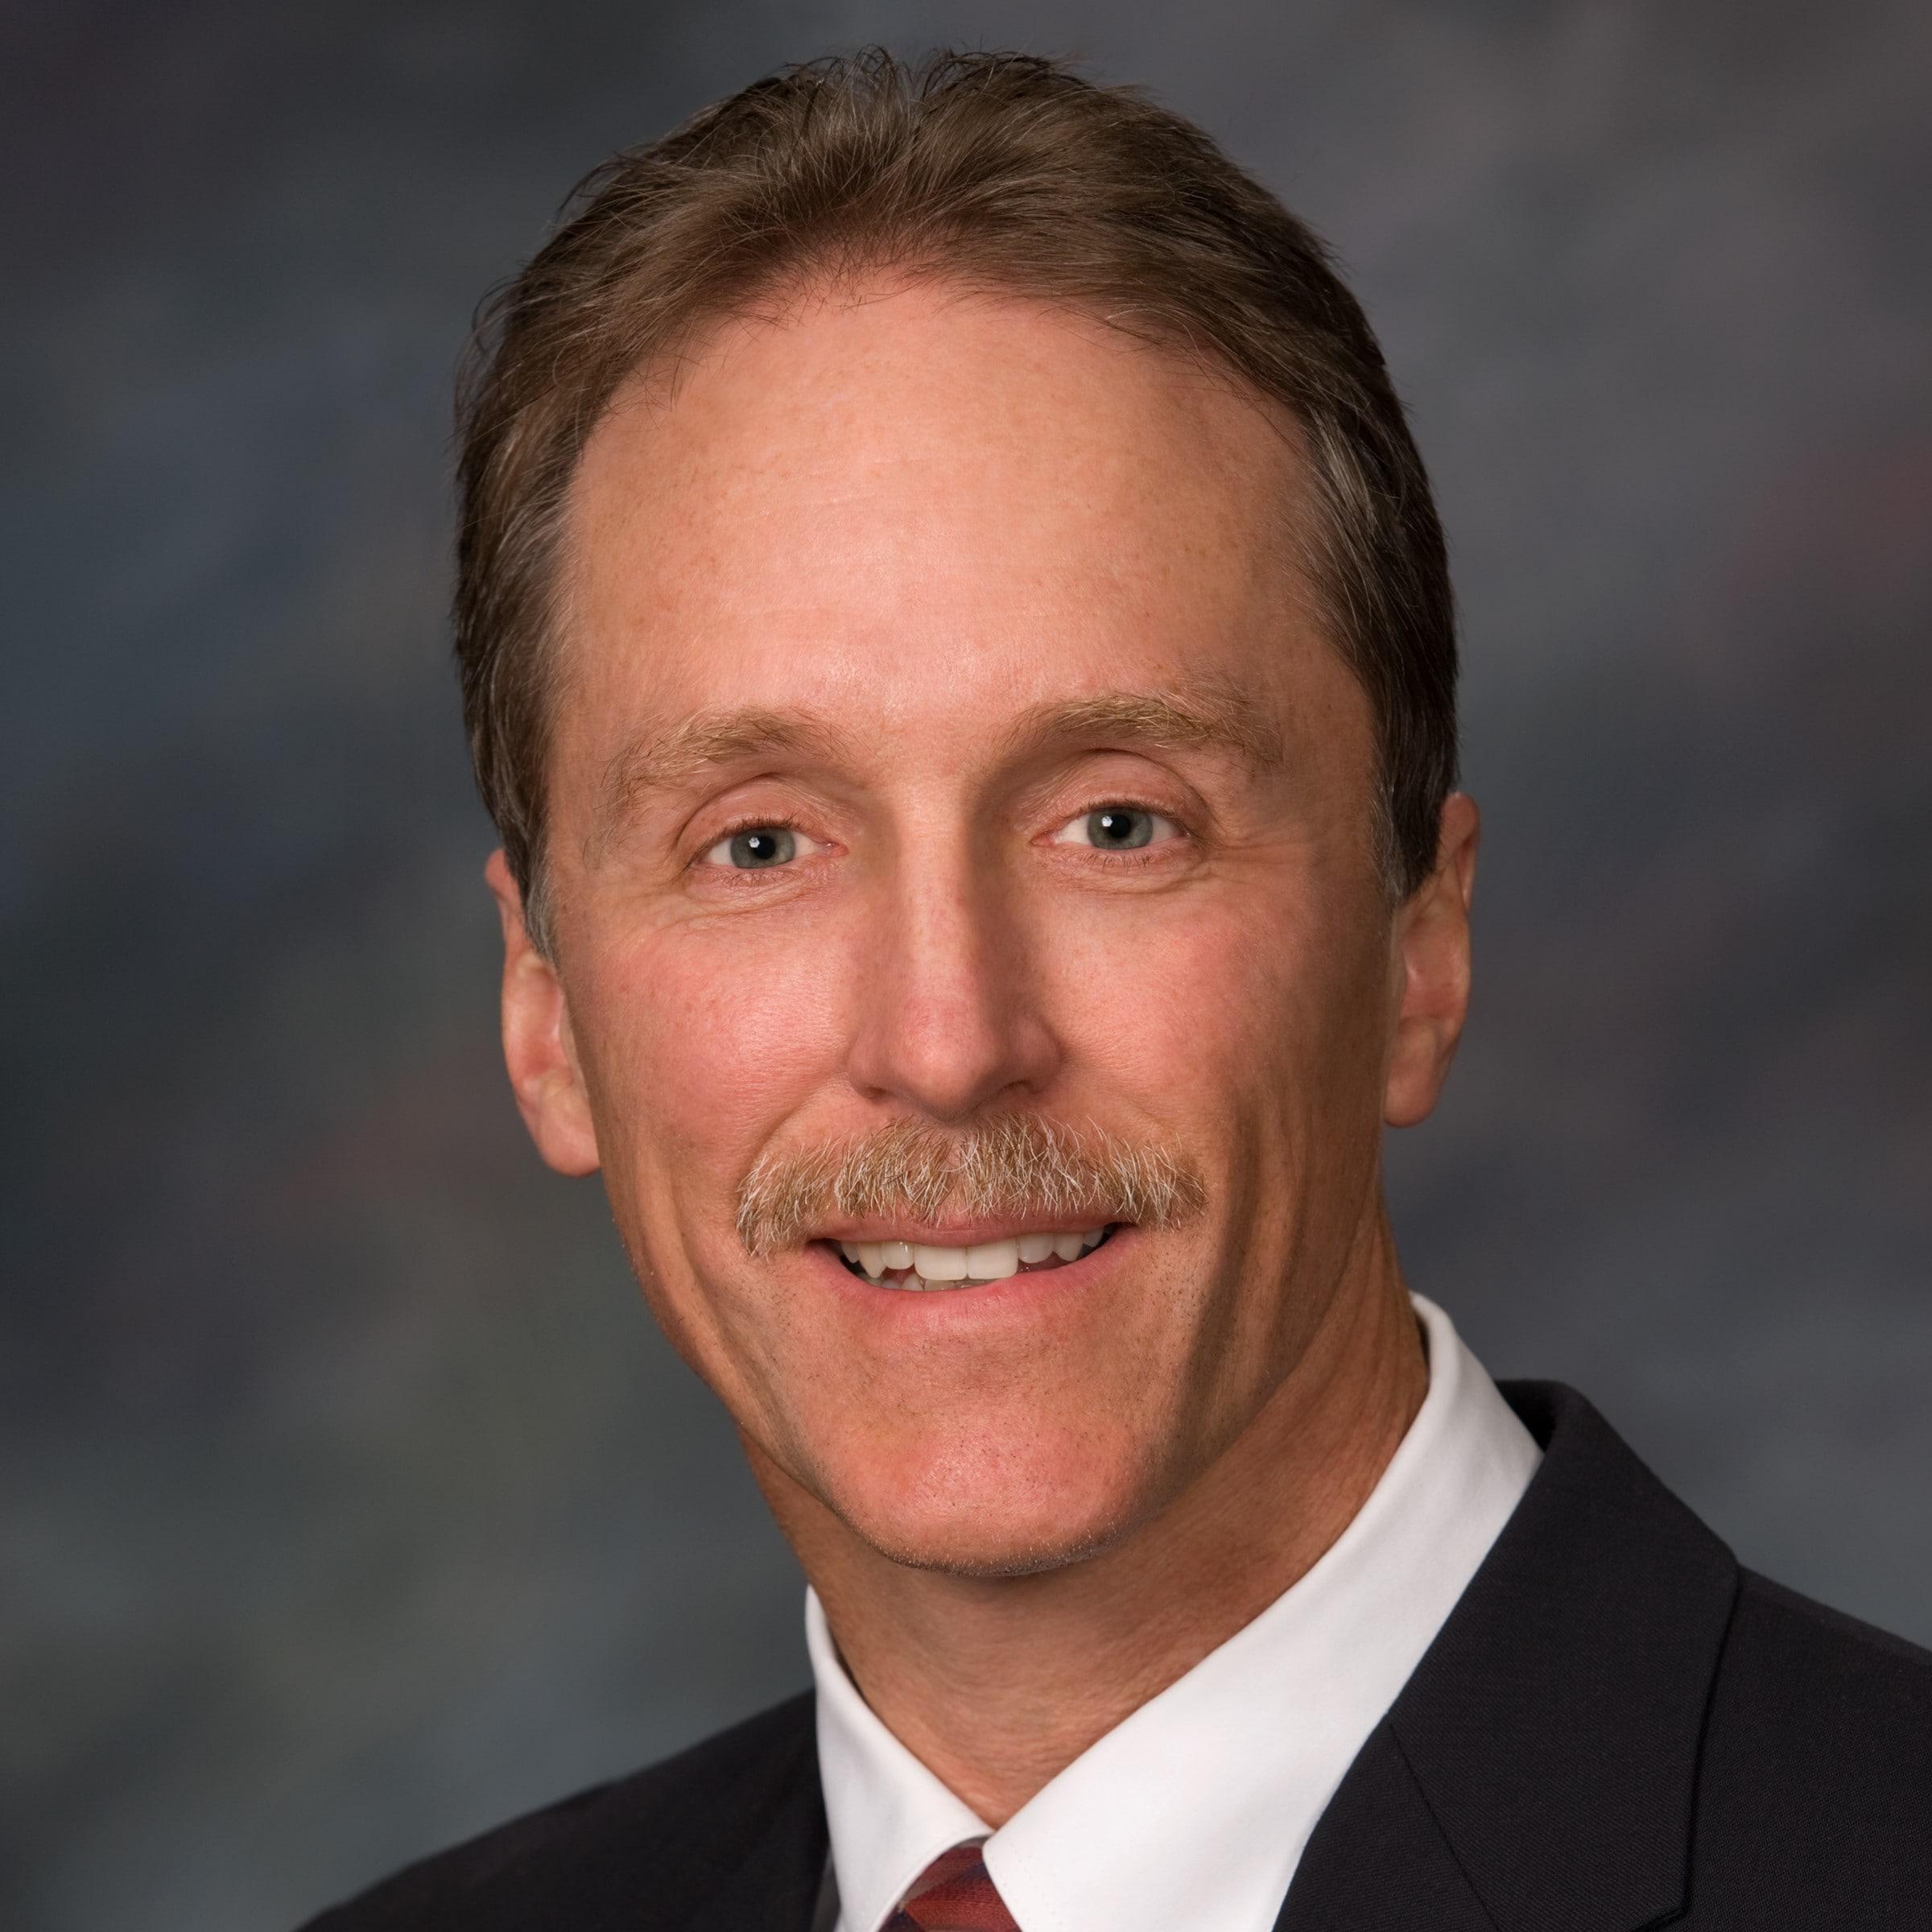 Dr. David W Shenton MD